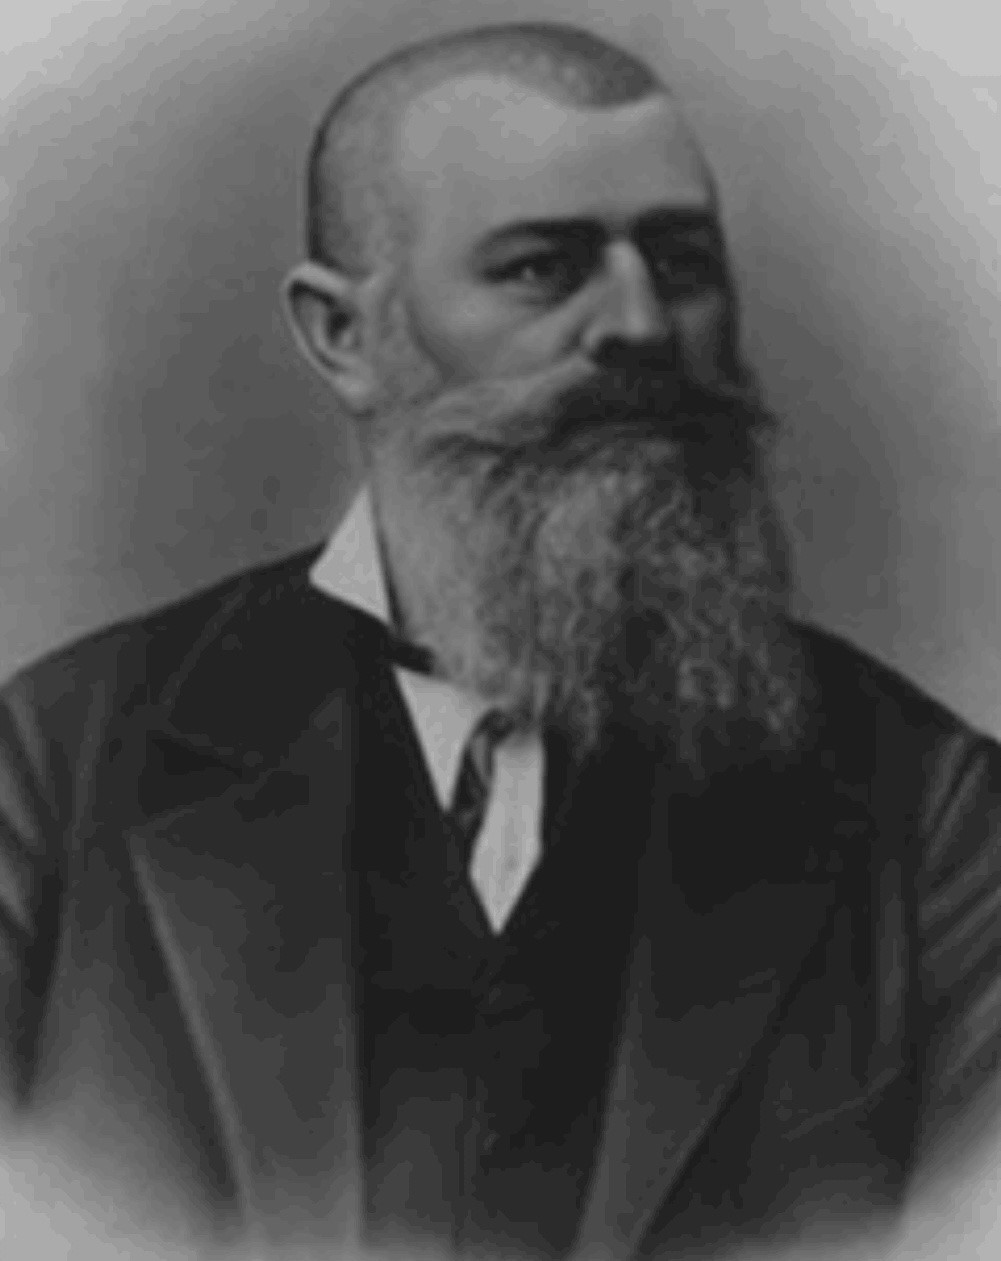 JOVAN ZIVANOVIC